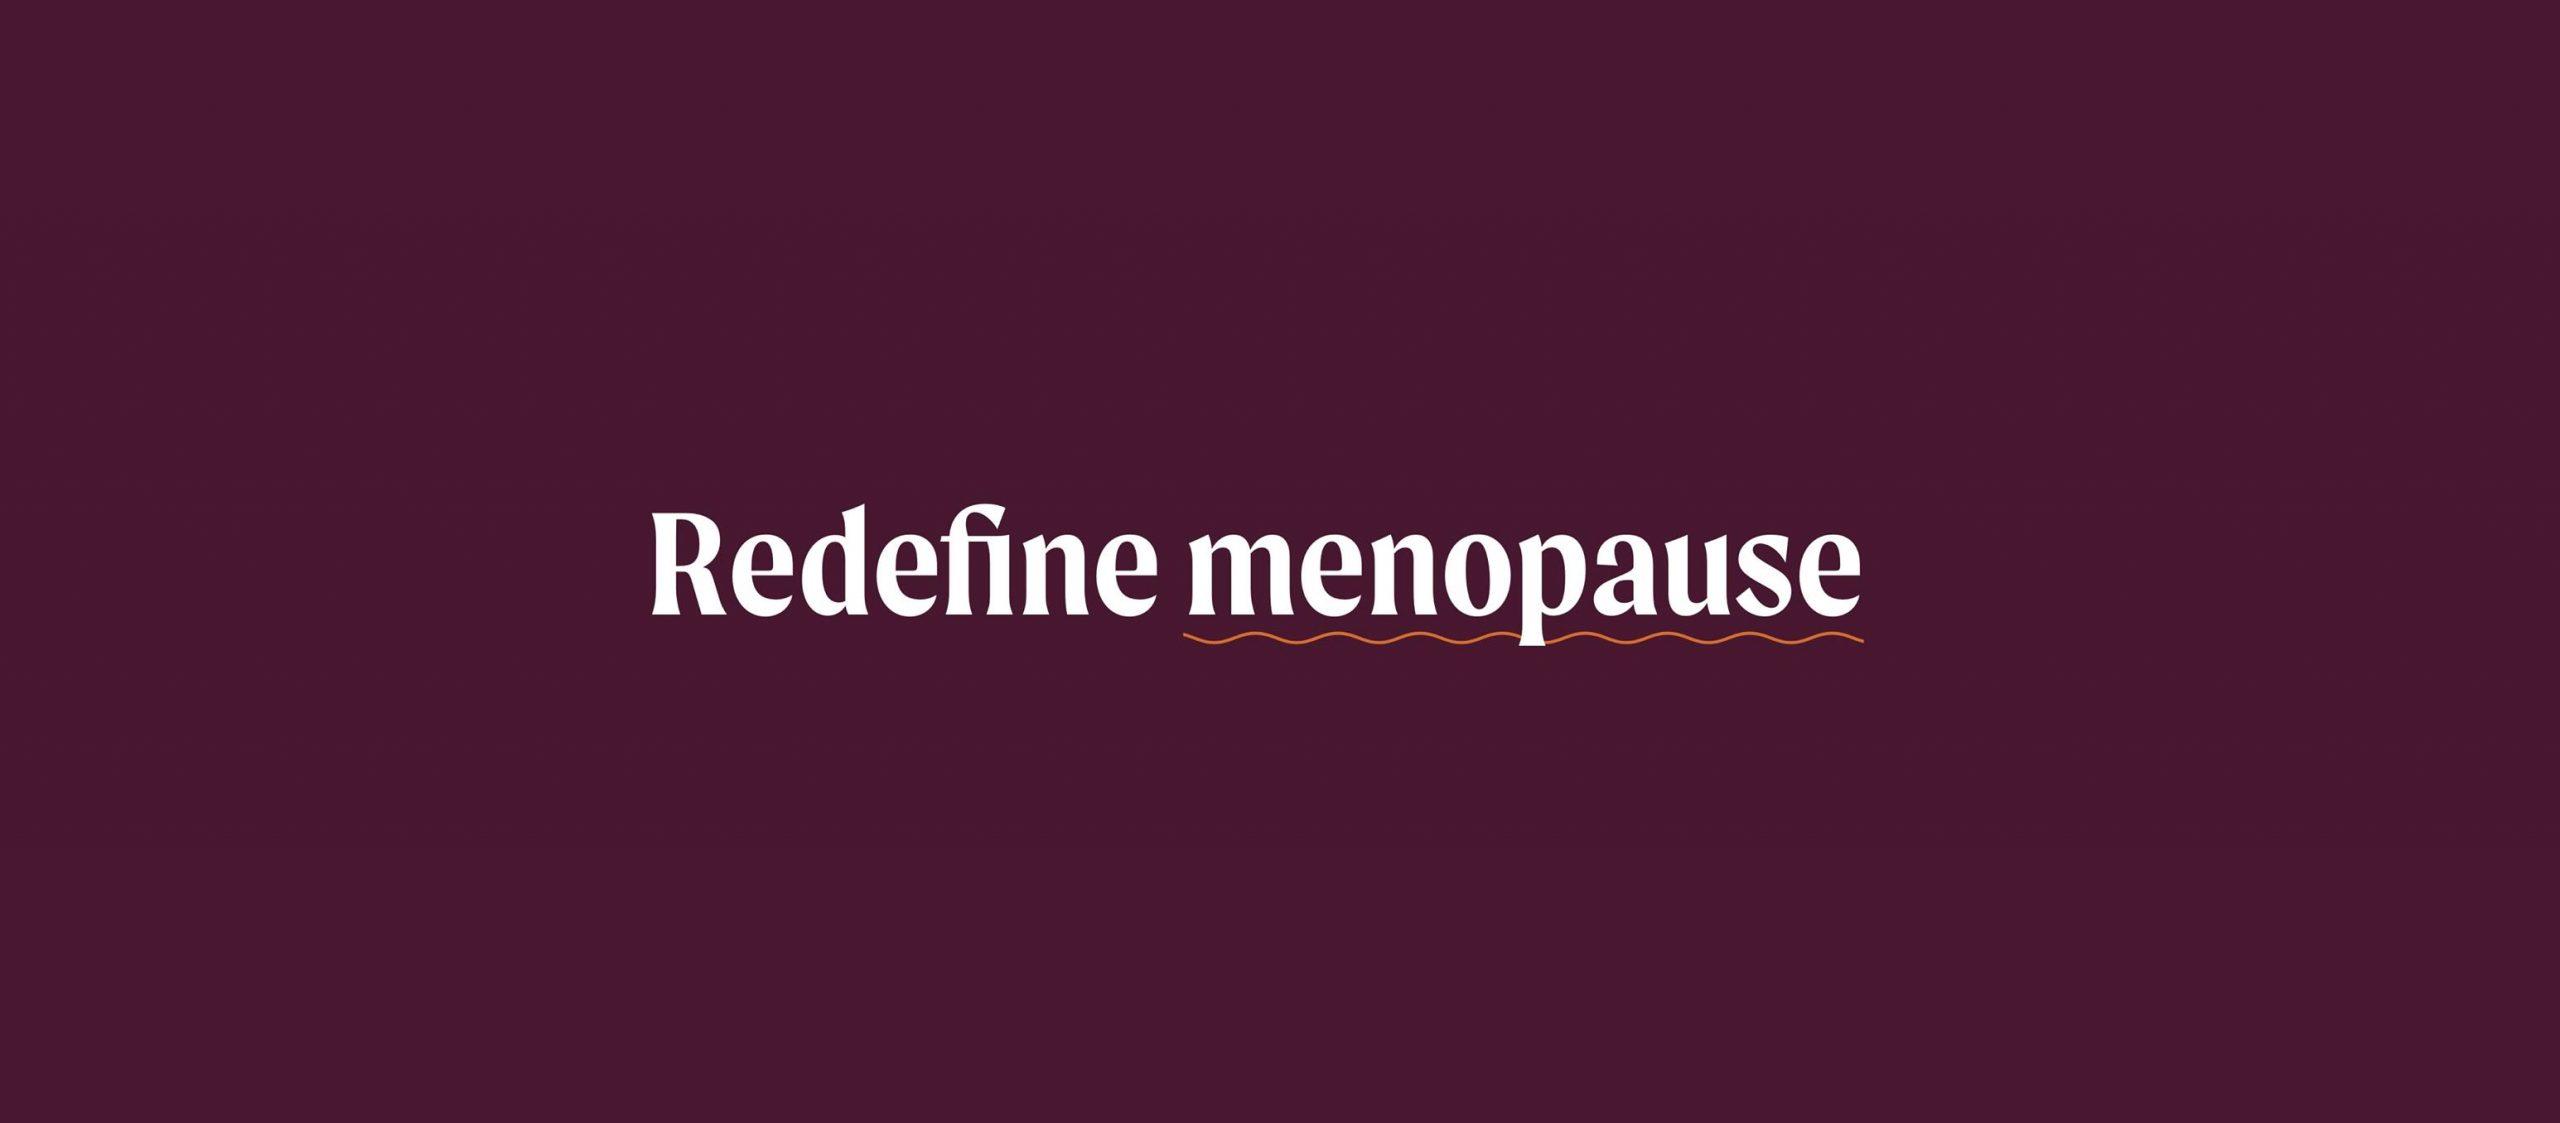 Evernow (Menopause treatment)